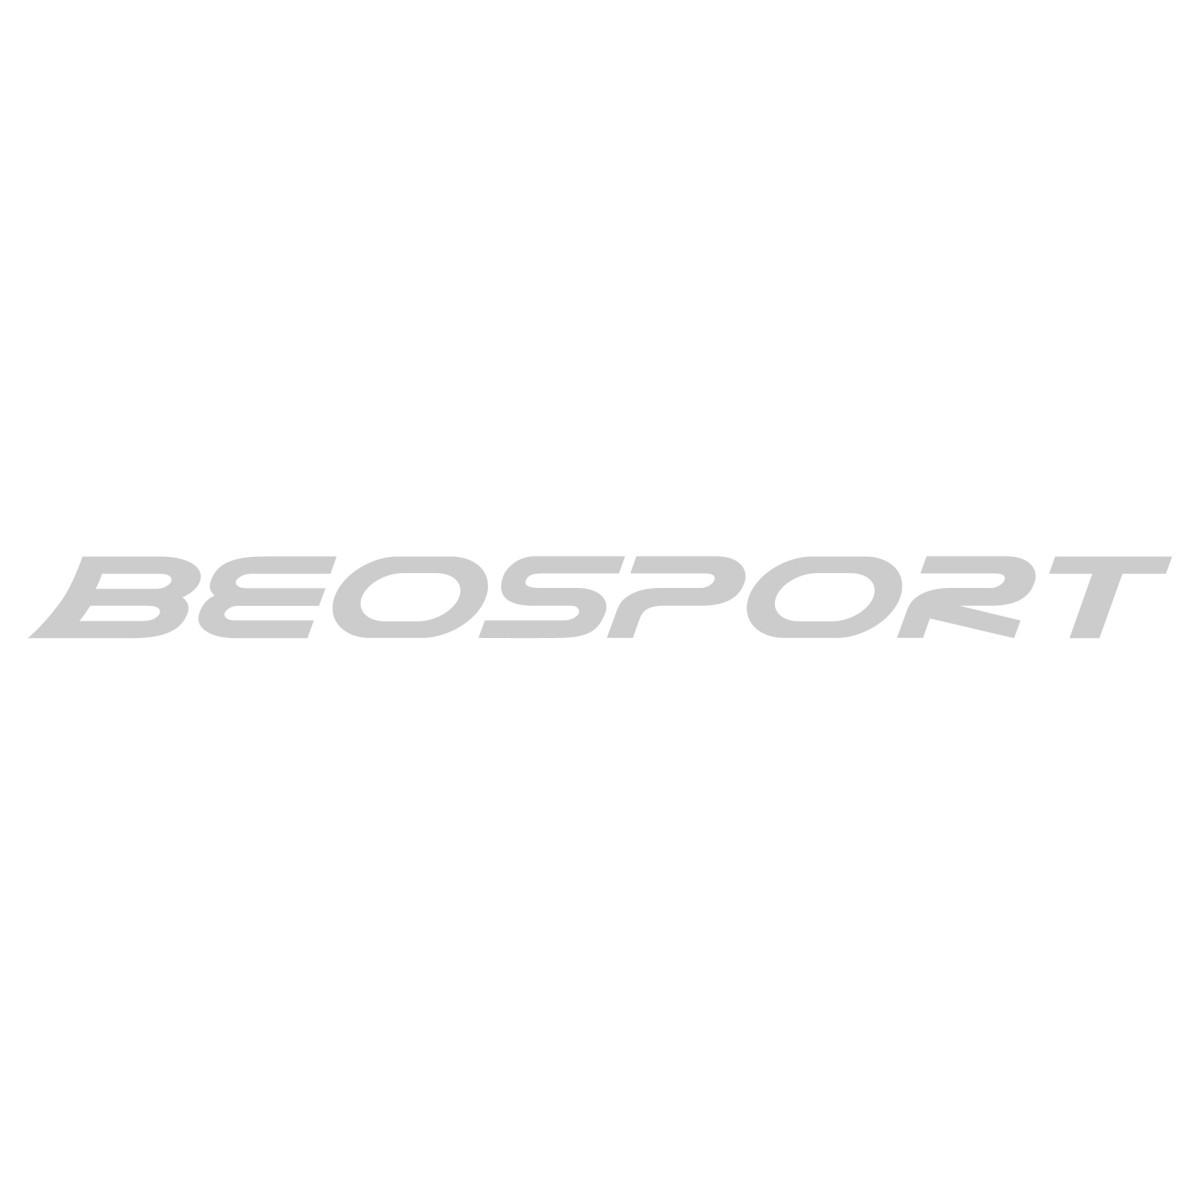 Wilson Revolve Spin 12.2m 1.25mm žica za rekete